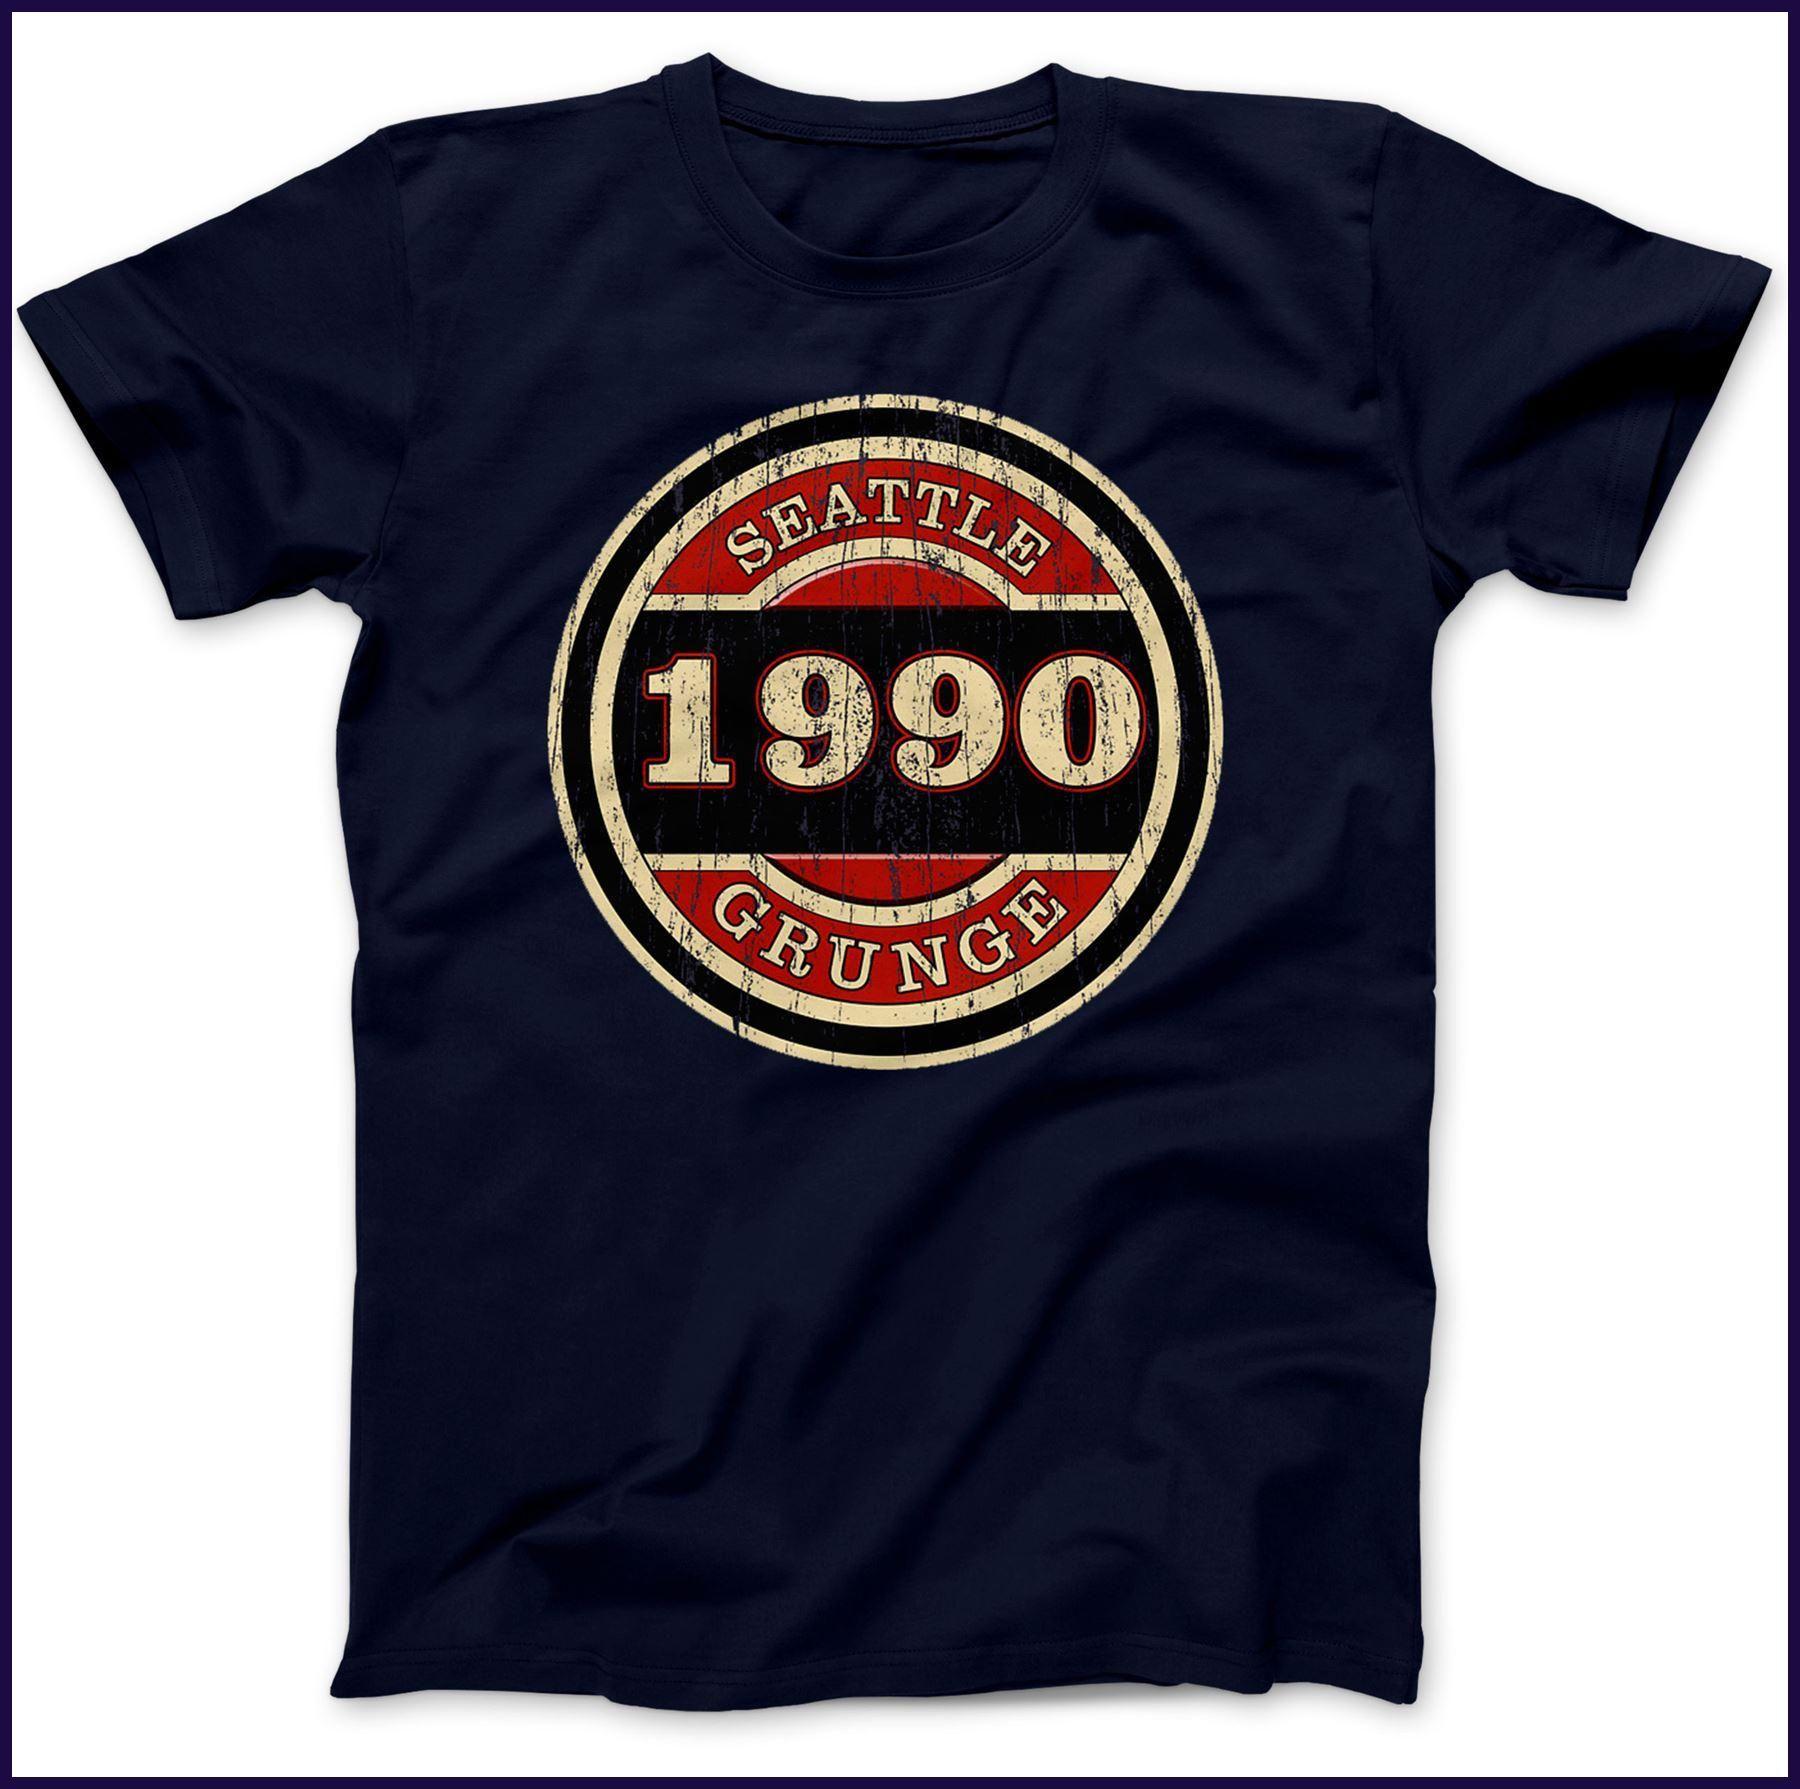 Seattle Grunge 1990 T Shirt 100 Premium Cotton Kurt Cobain Inspired